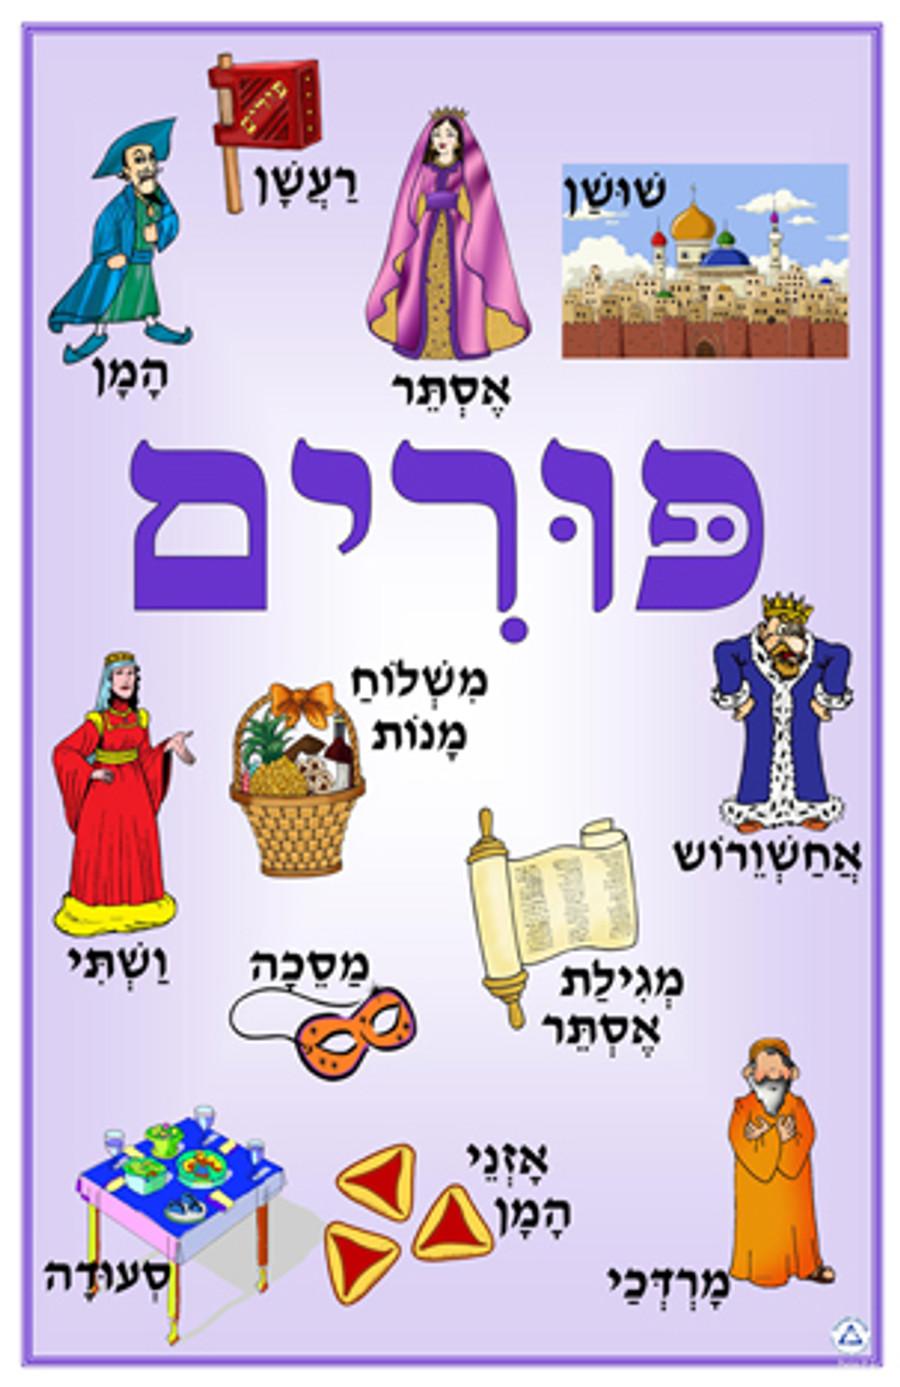 Purim Symbols Poster